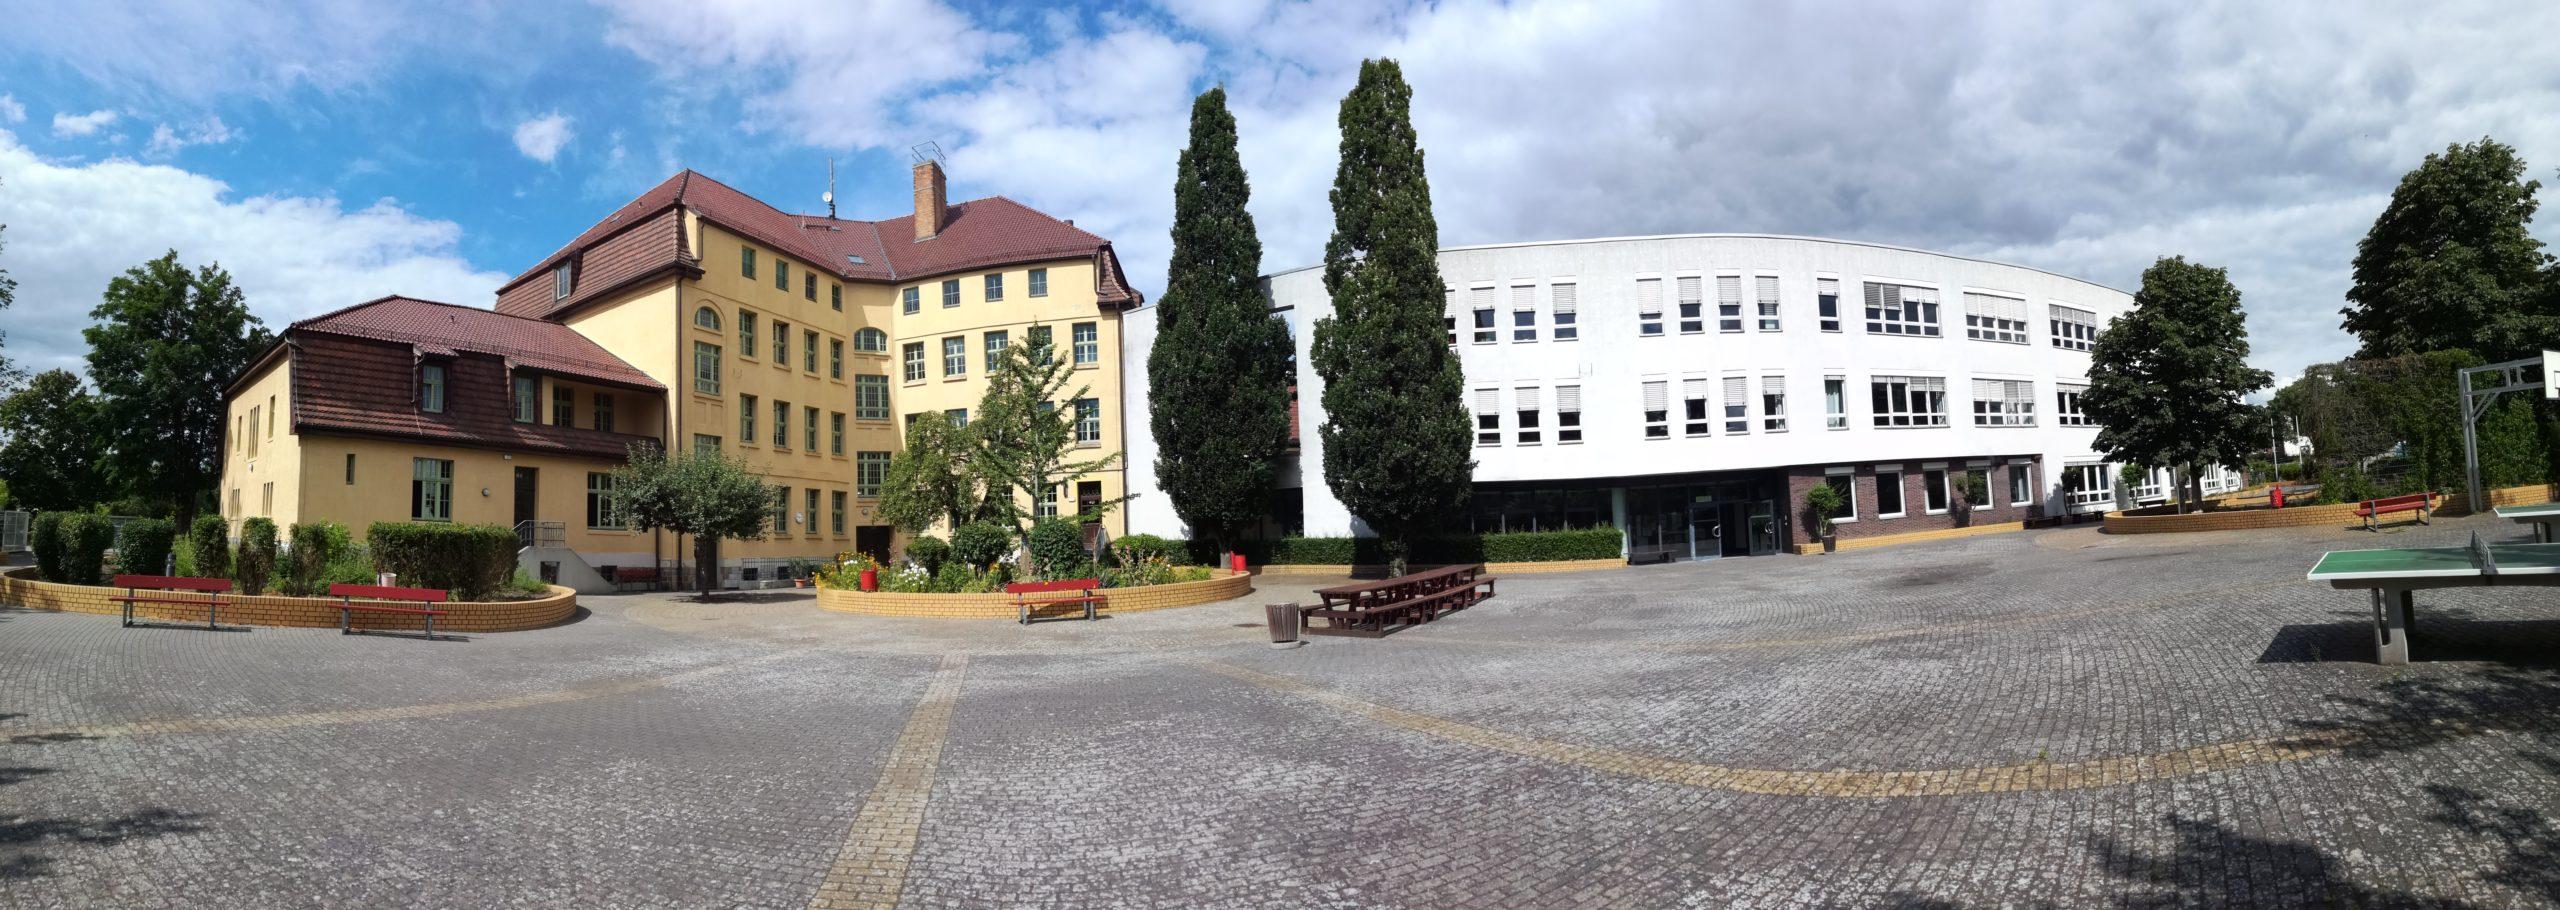 Schulhof-Panorama